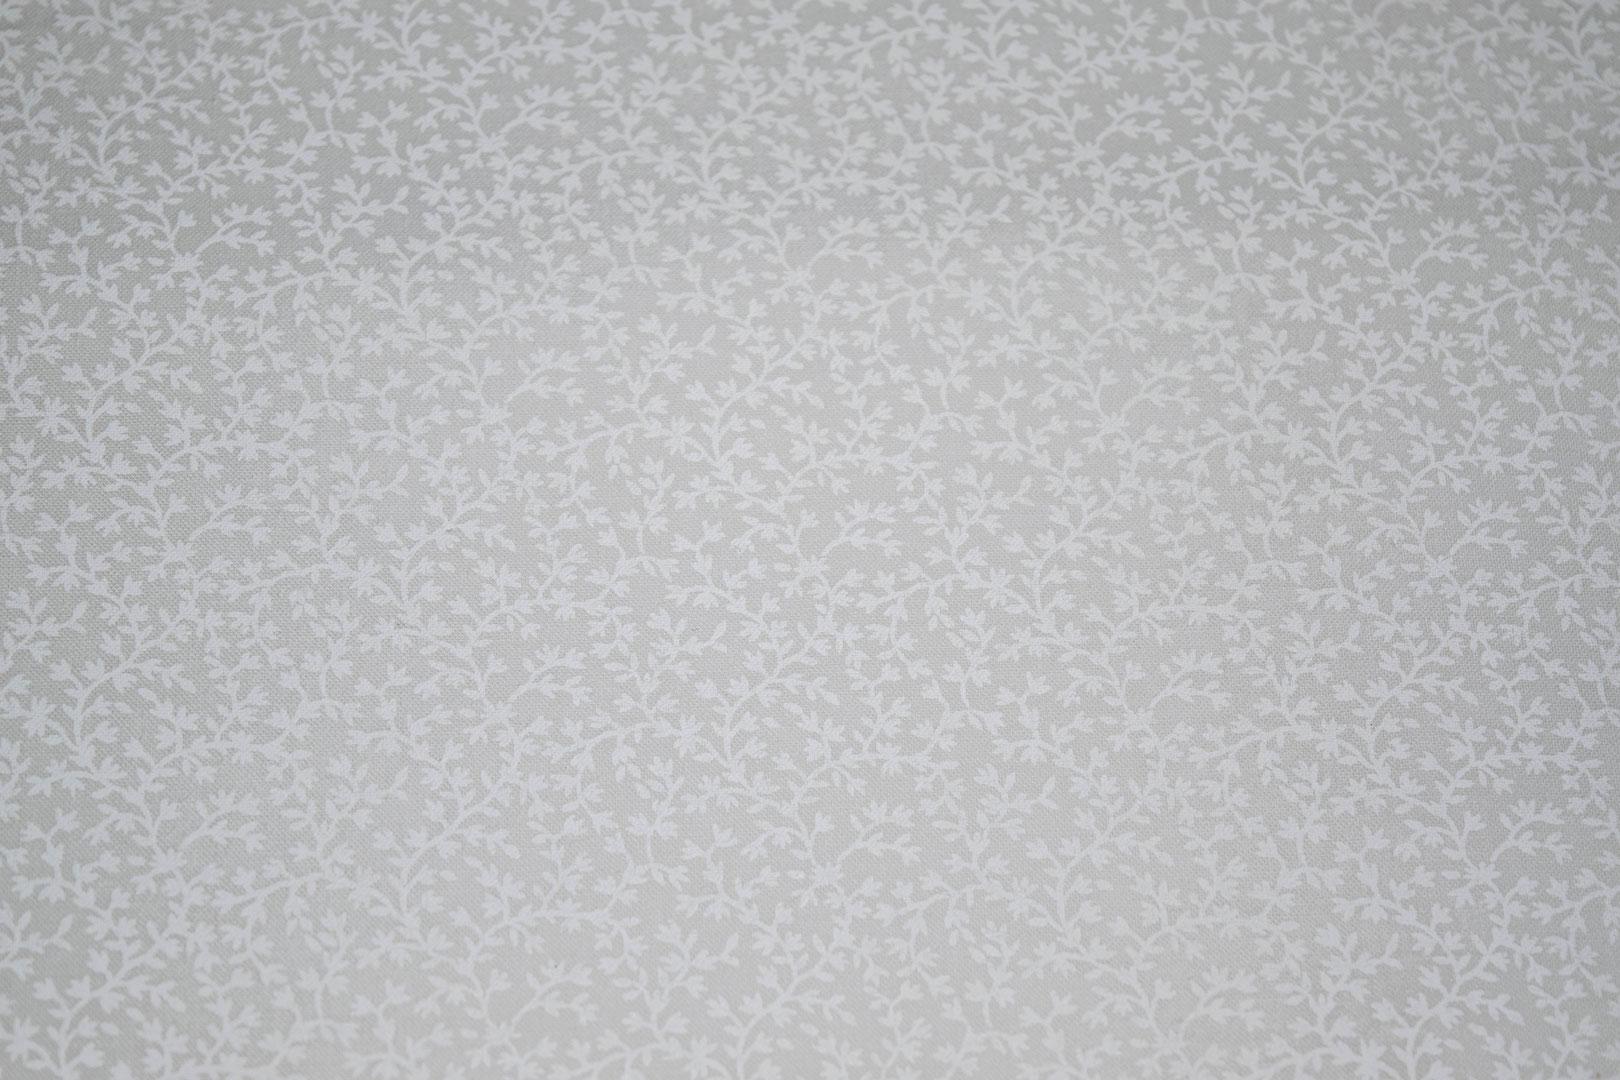 "8_36242_ww   44/45"" 68/68, 100% Carded Cotton"